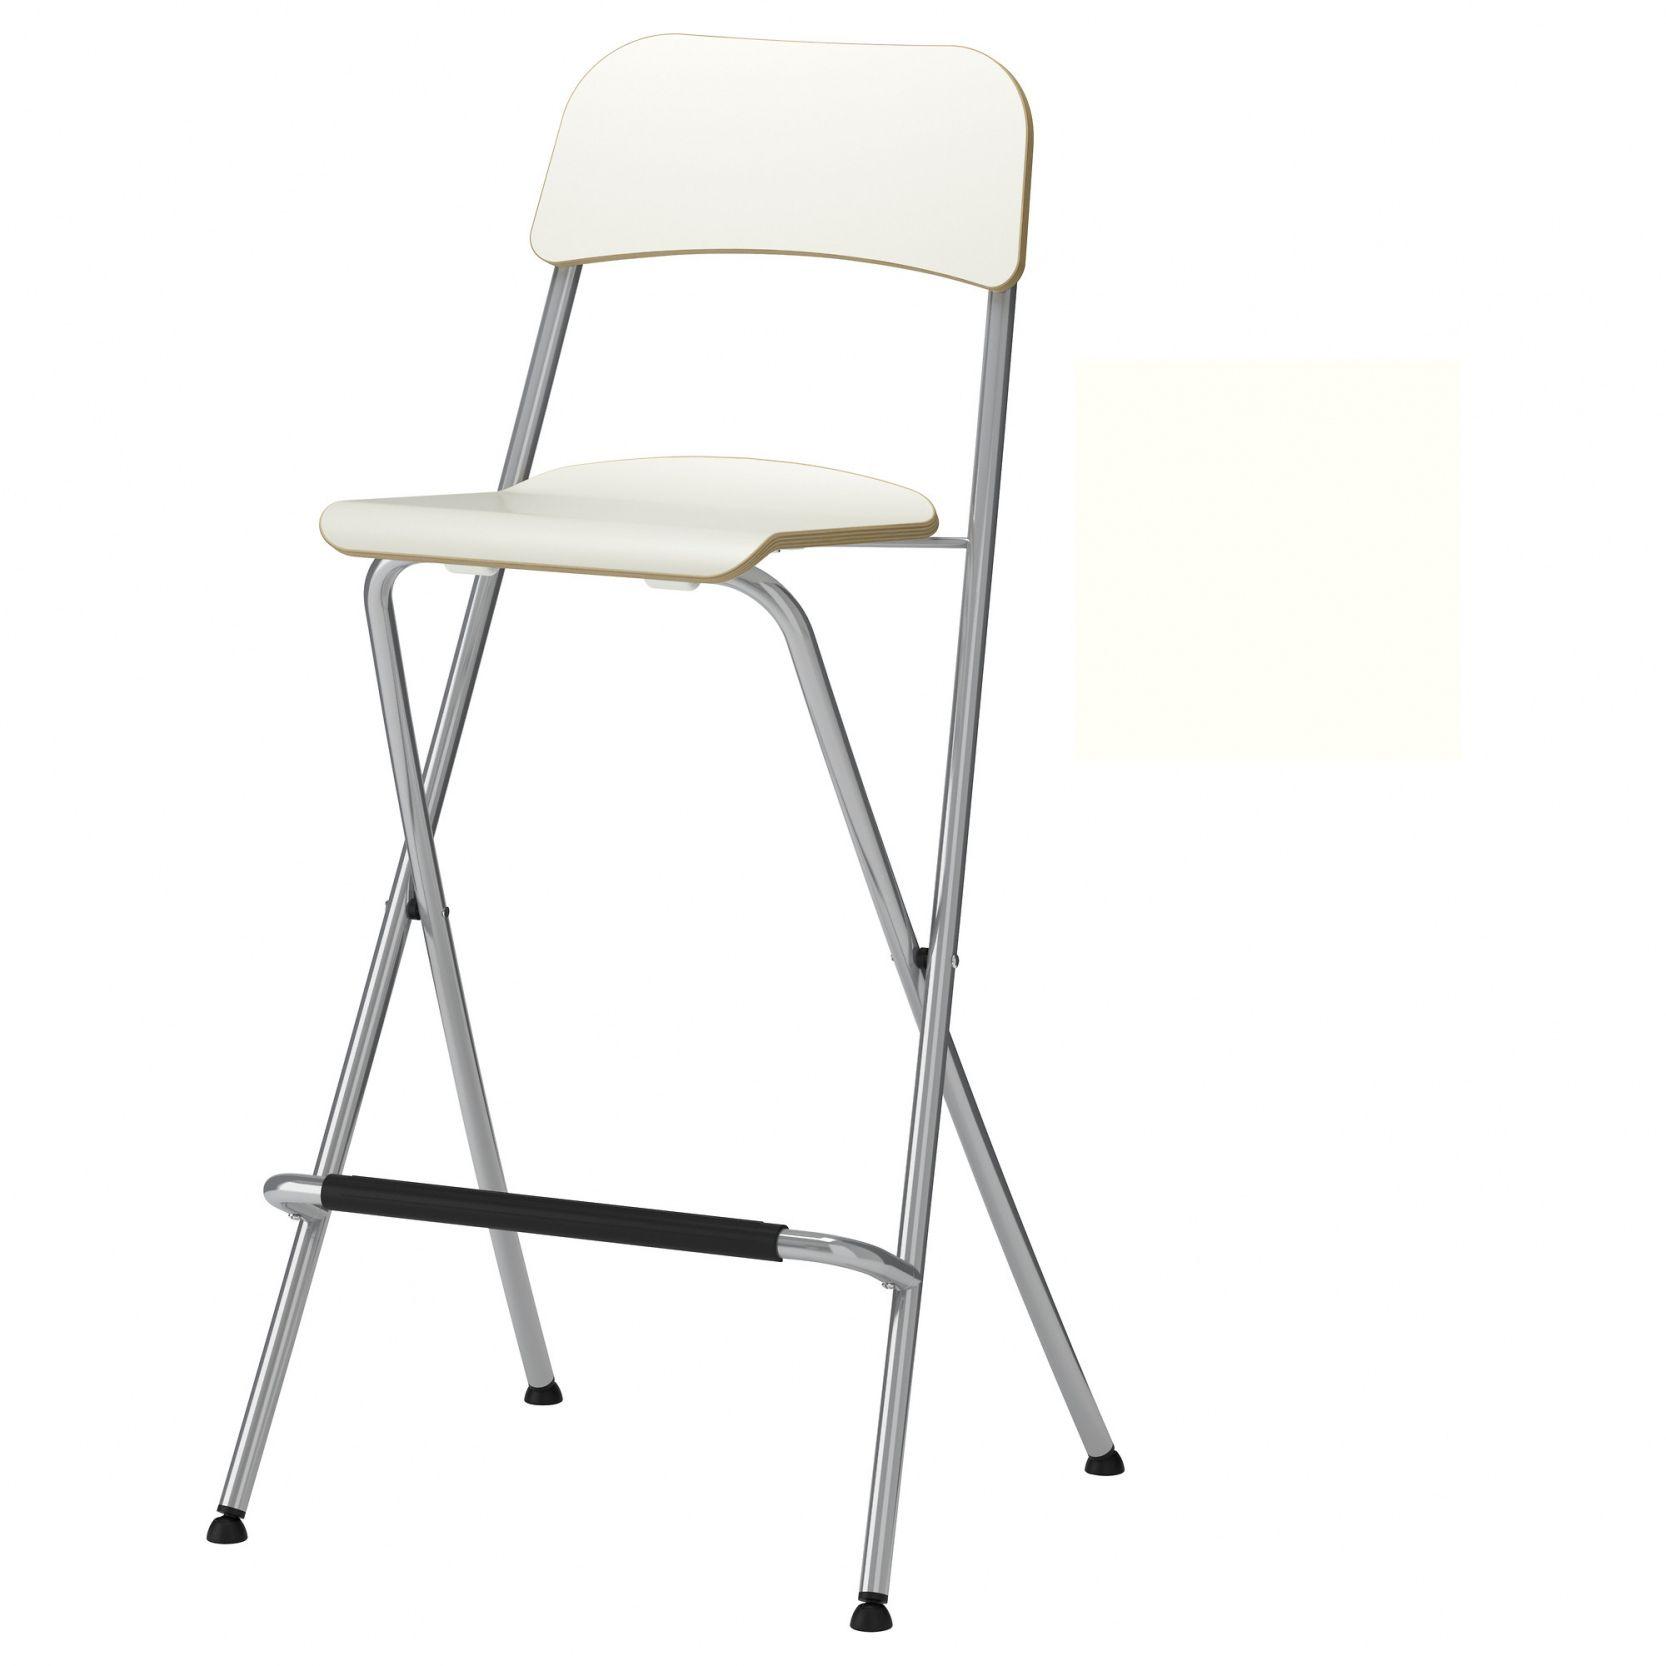 77 High Bar Stools Ikea Modern Affordable Furniture Check more at